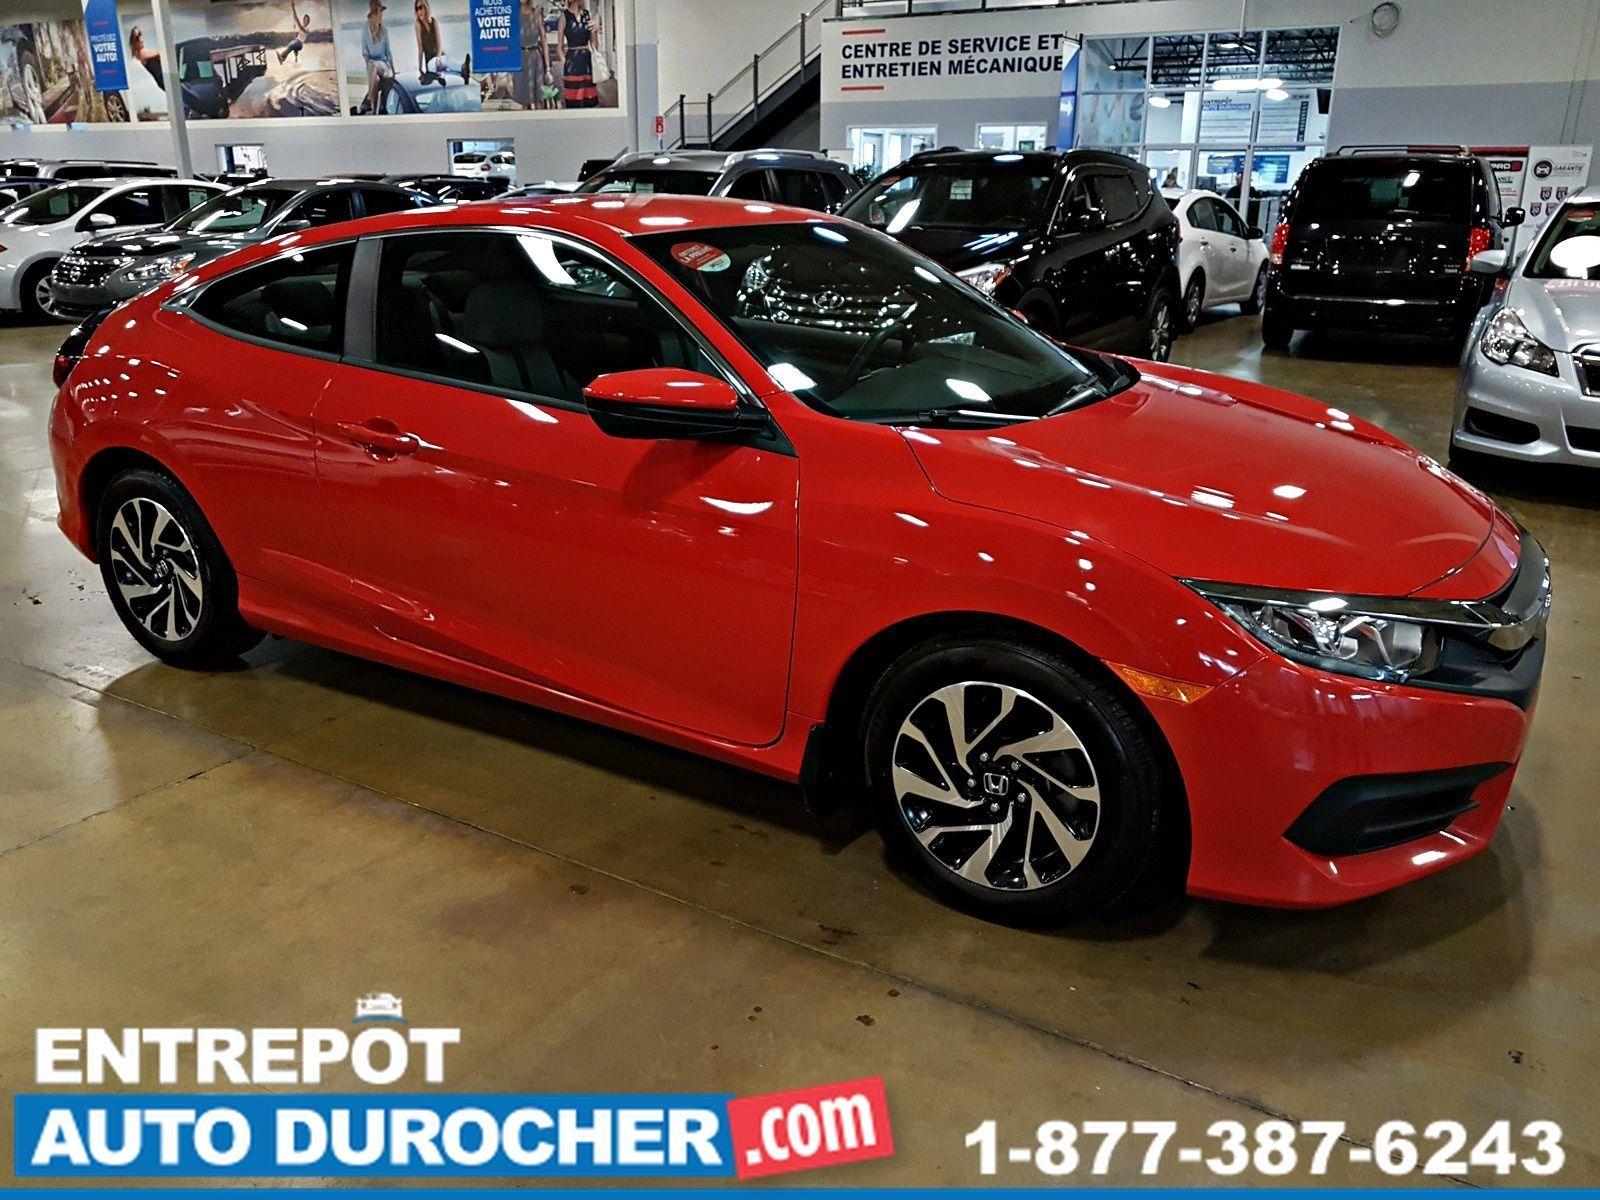 2017  Honda Civic Coupe LX - AIR CLIMATISÉ - Caméra de Recul - Bluetooth